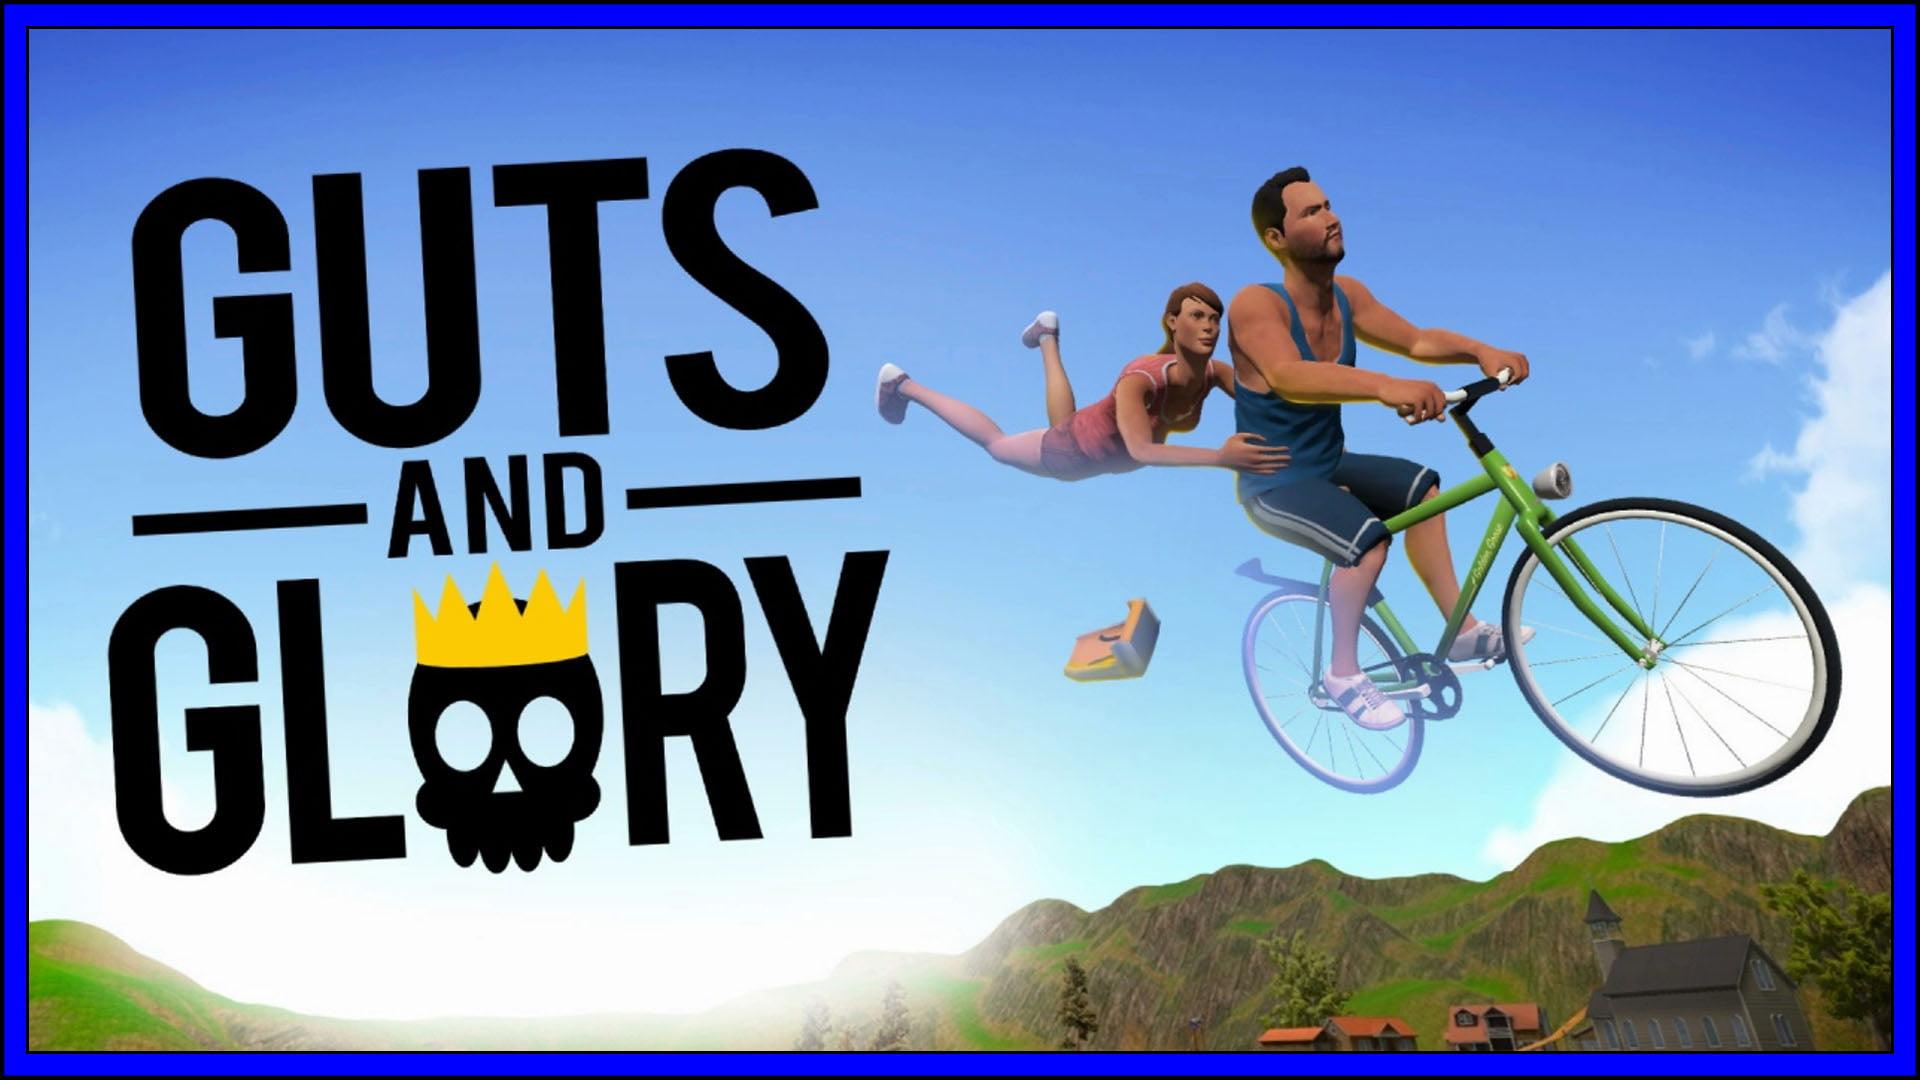 Guts And Glory Fi3